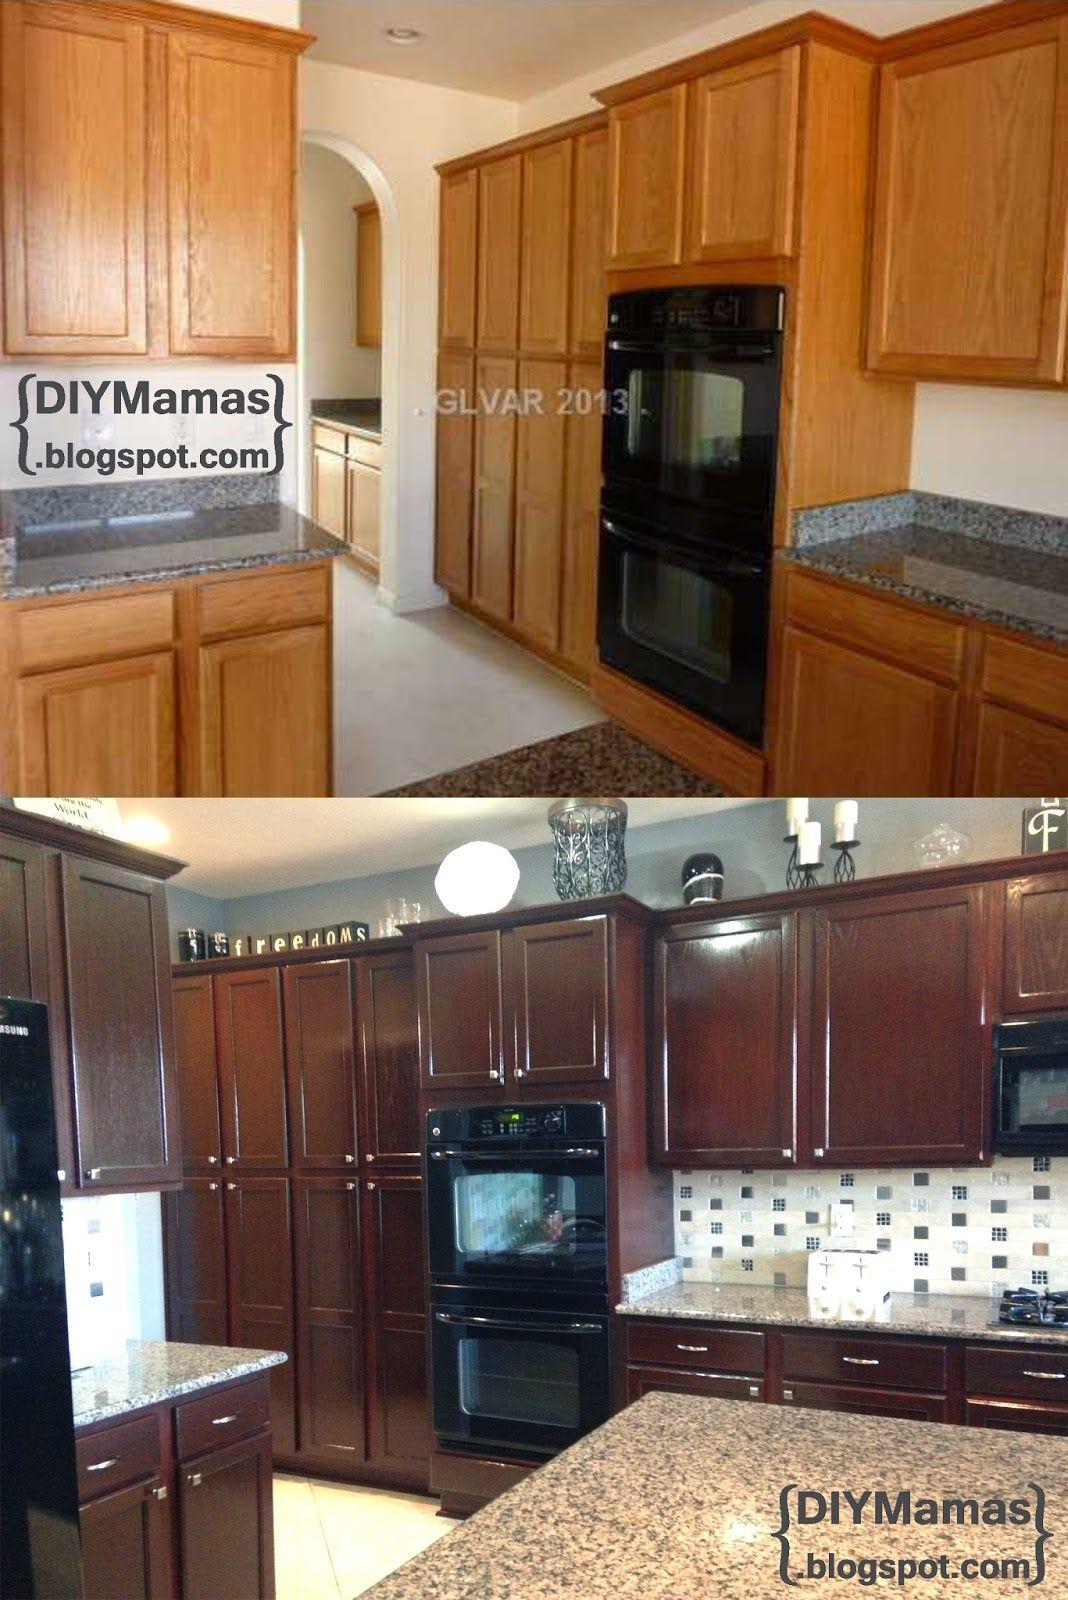 Diy Mamas Kitchen Makeover Gel Stain Backsplash